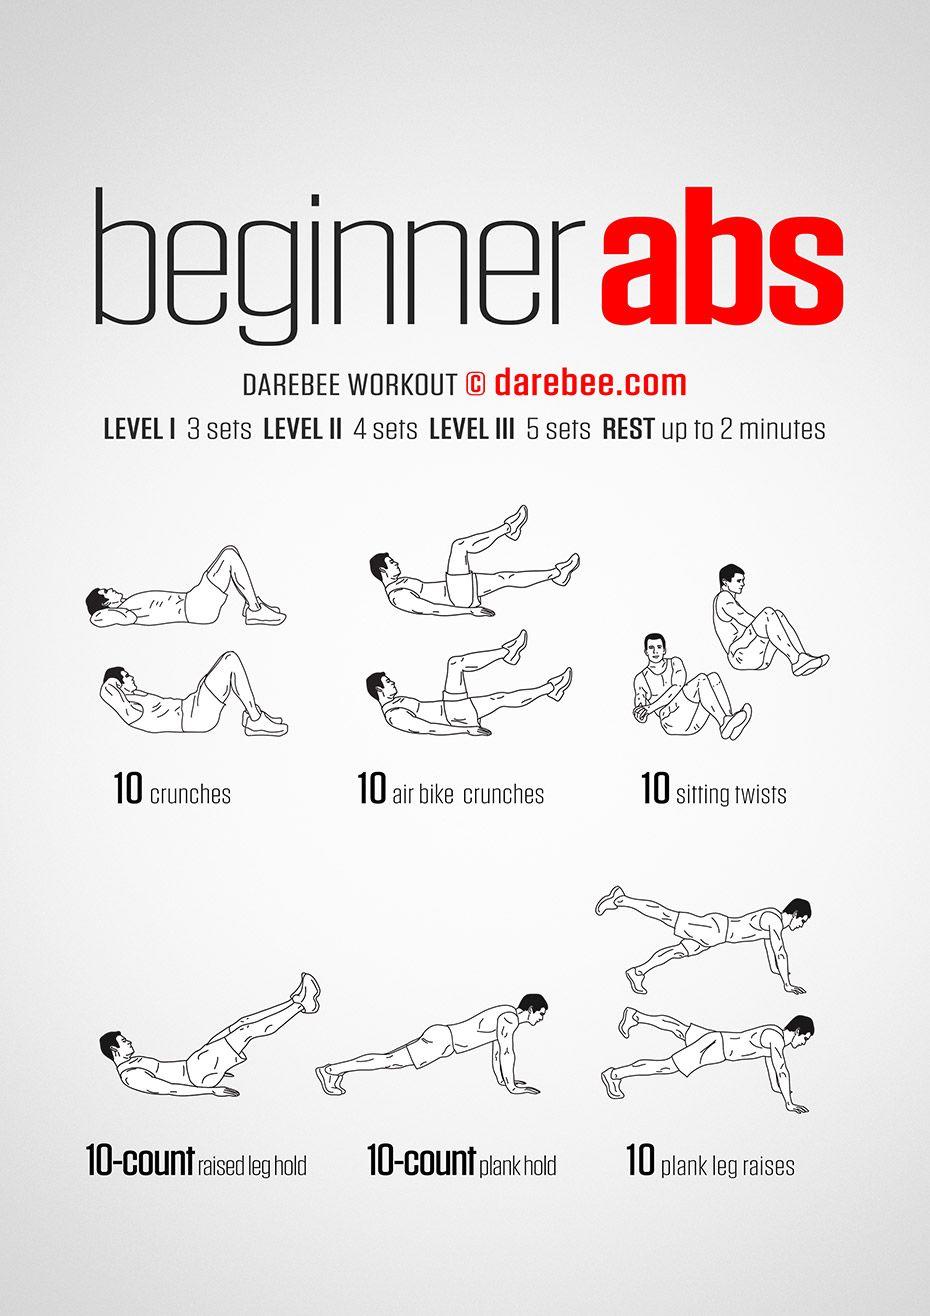 Beginner Abs Workout Gym Workout For Beginners Beginner Ab